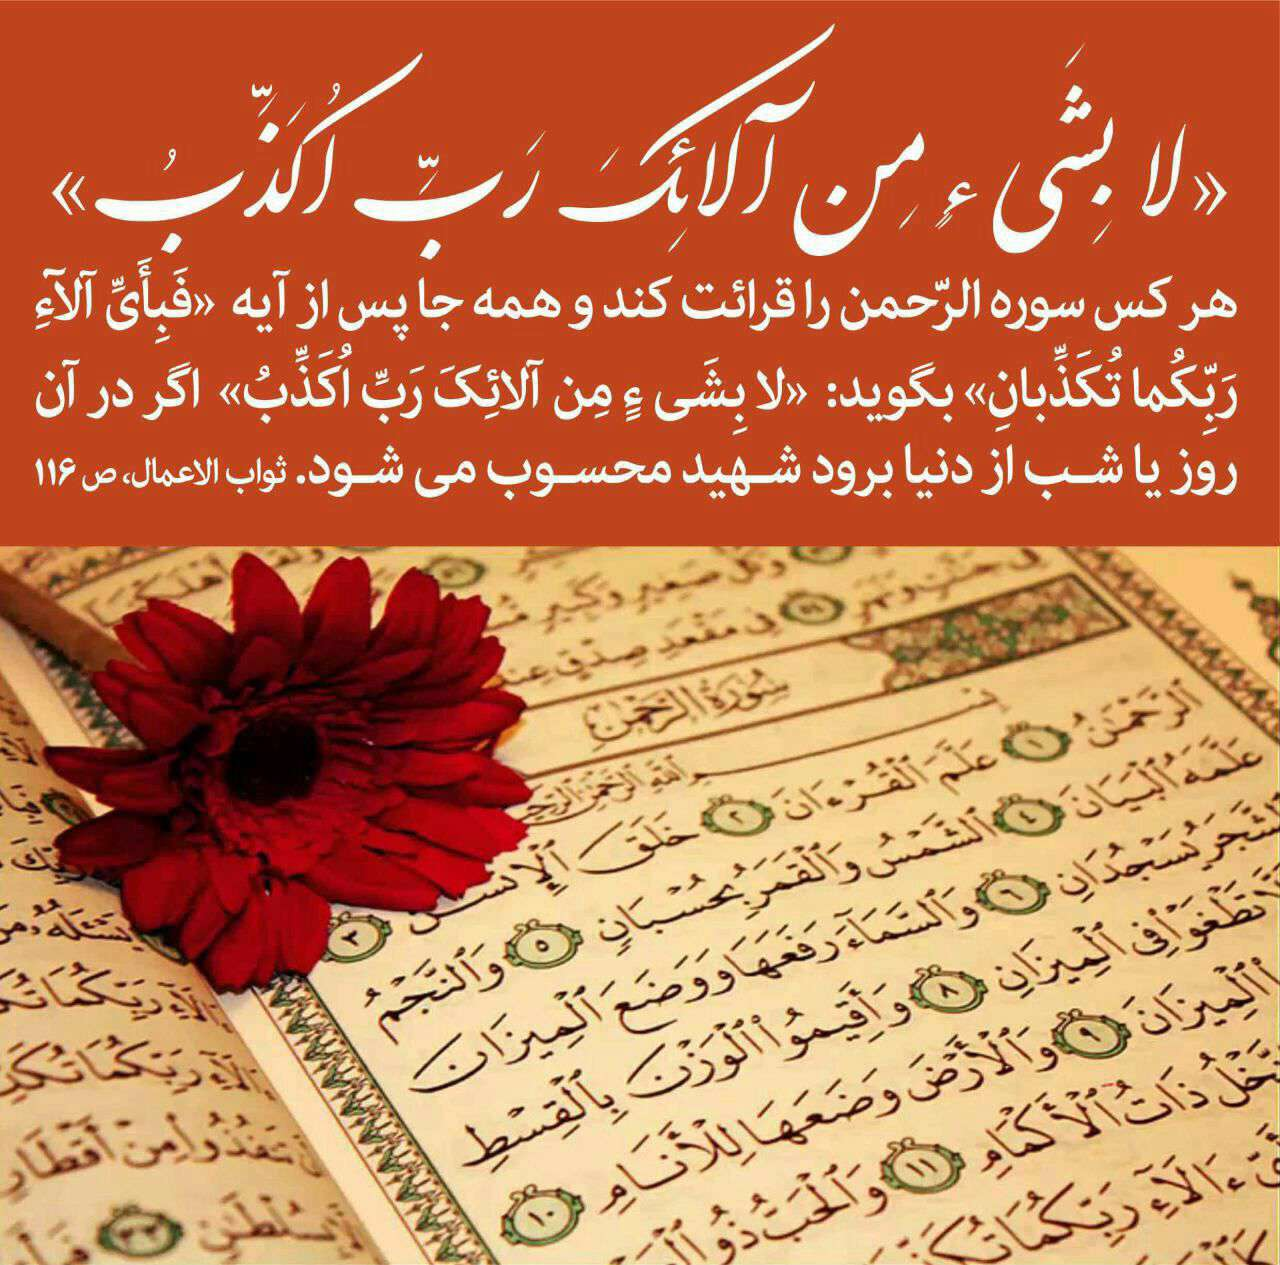 سوره الرحمن و شهادت